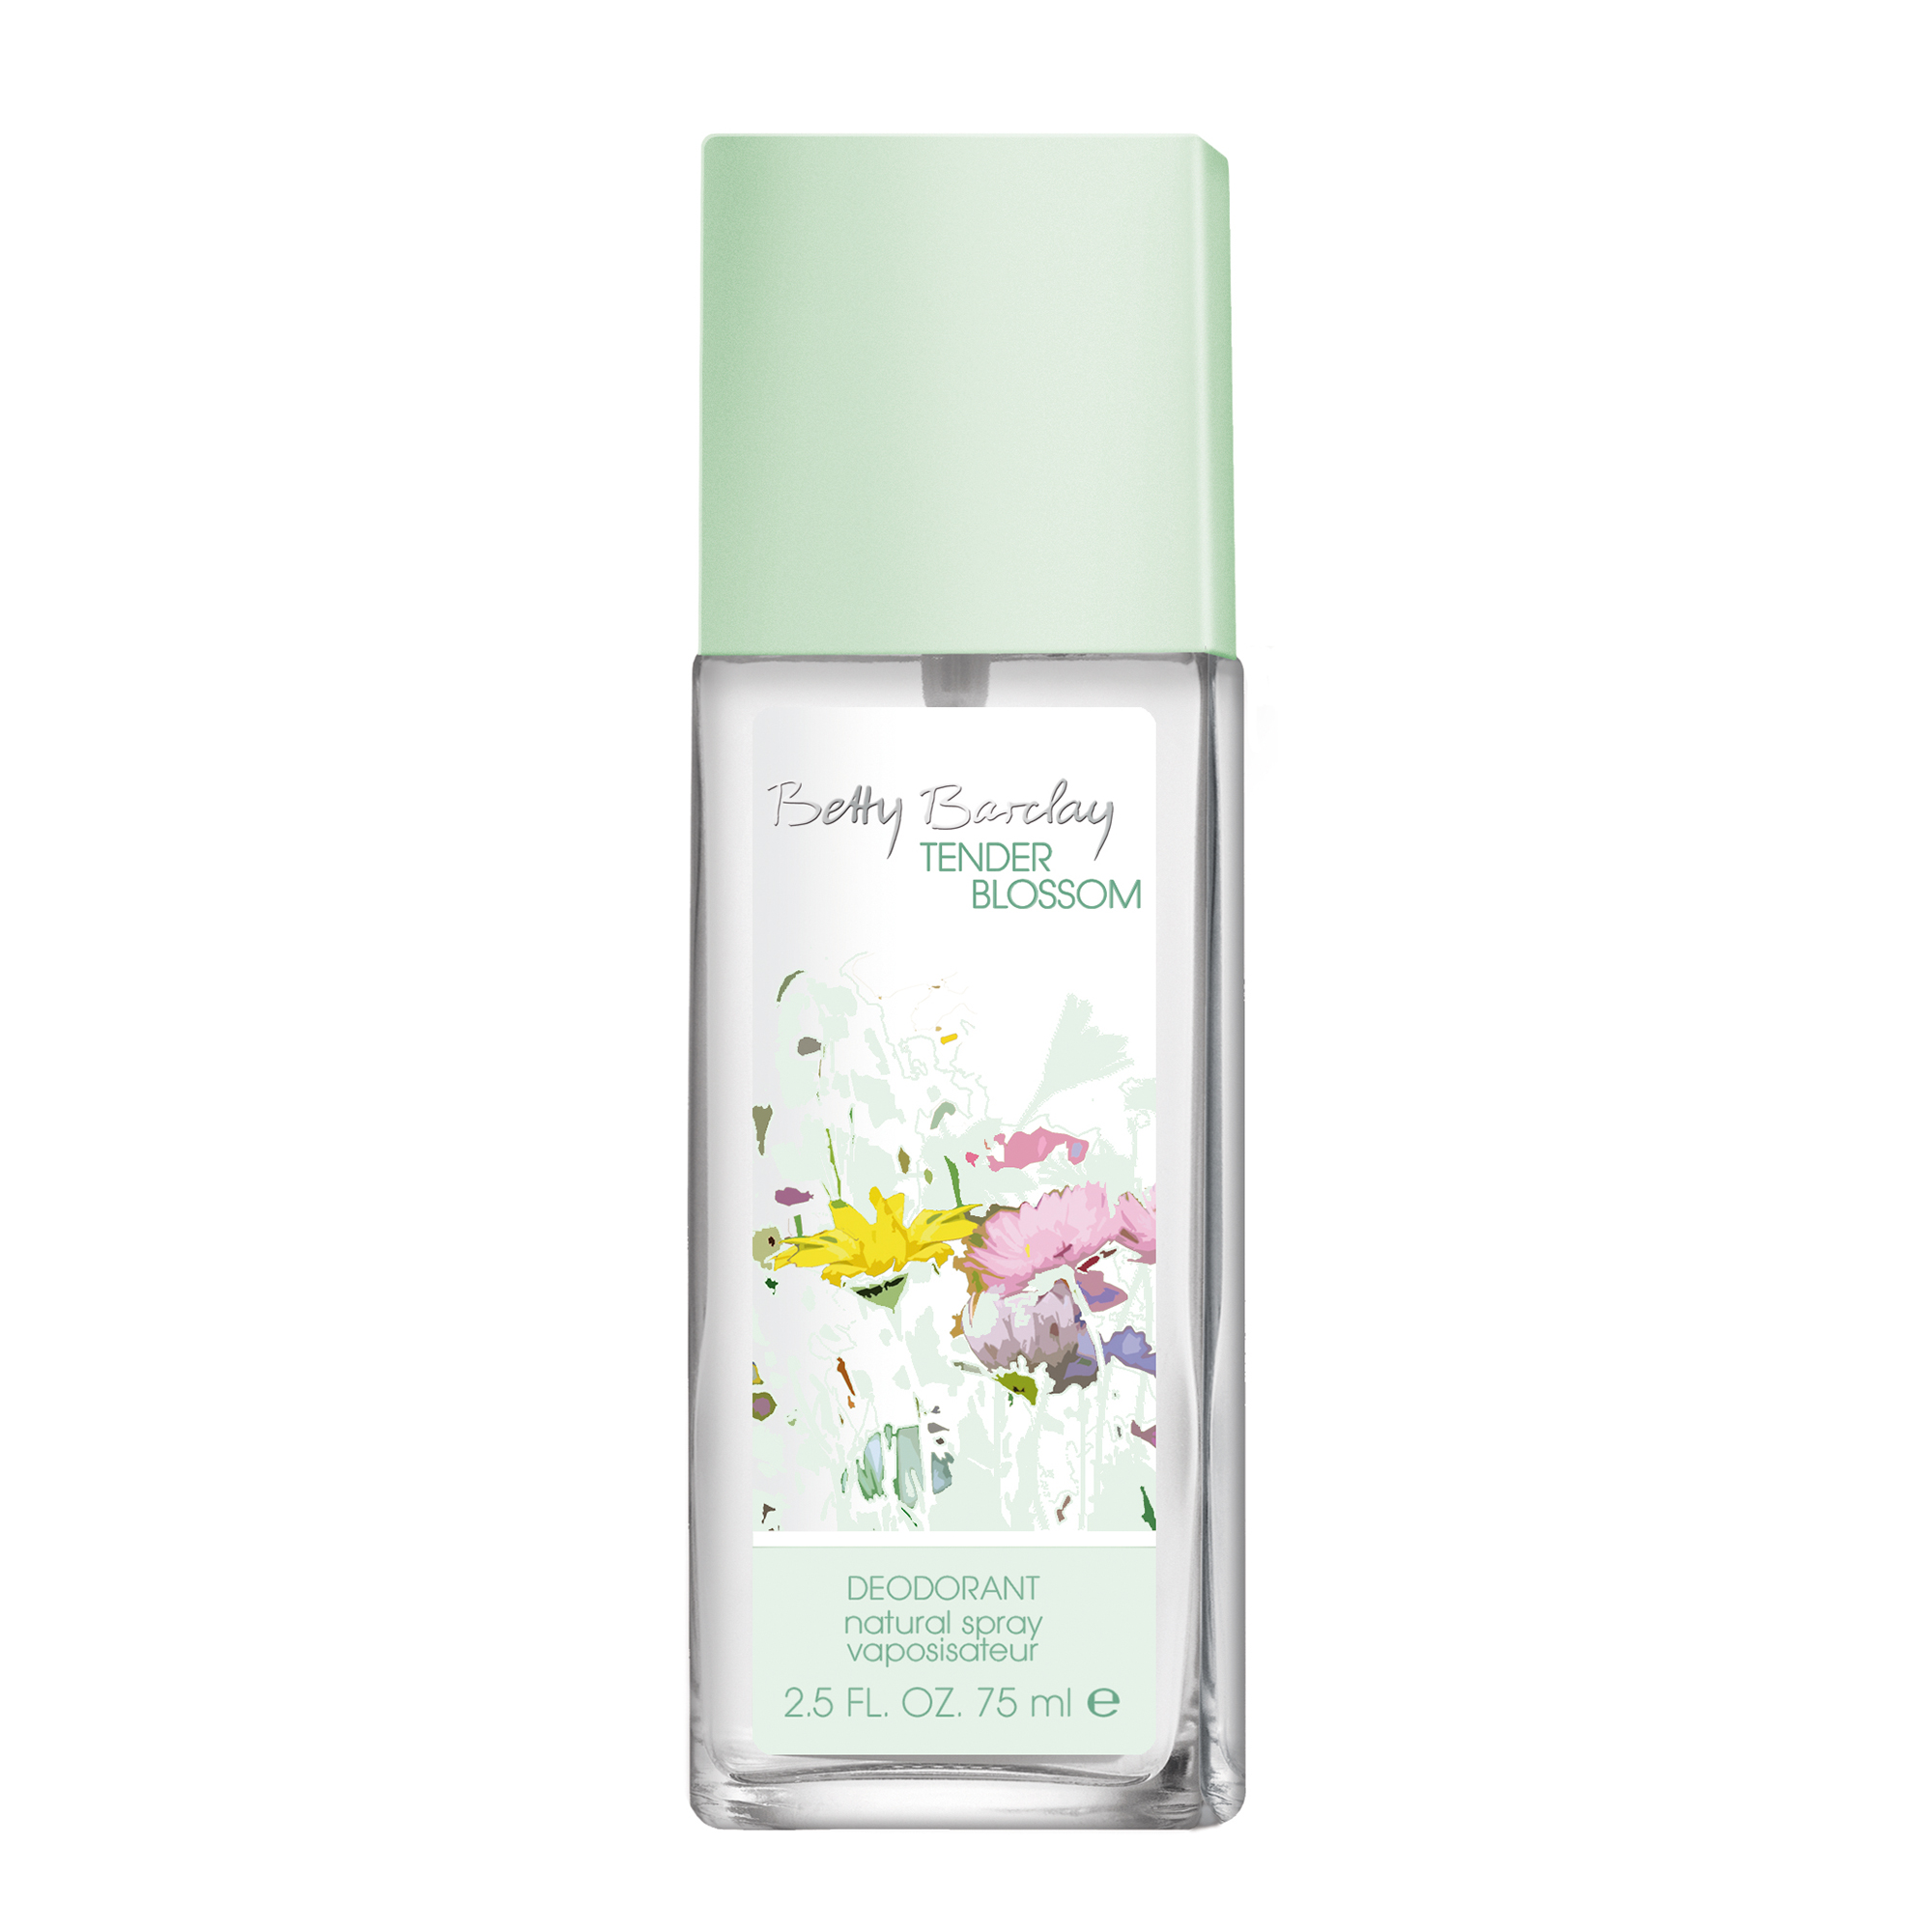 Betty Barclay | Betty Barclay Tender Blossom Deodorant Natural Spray 75ml